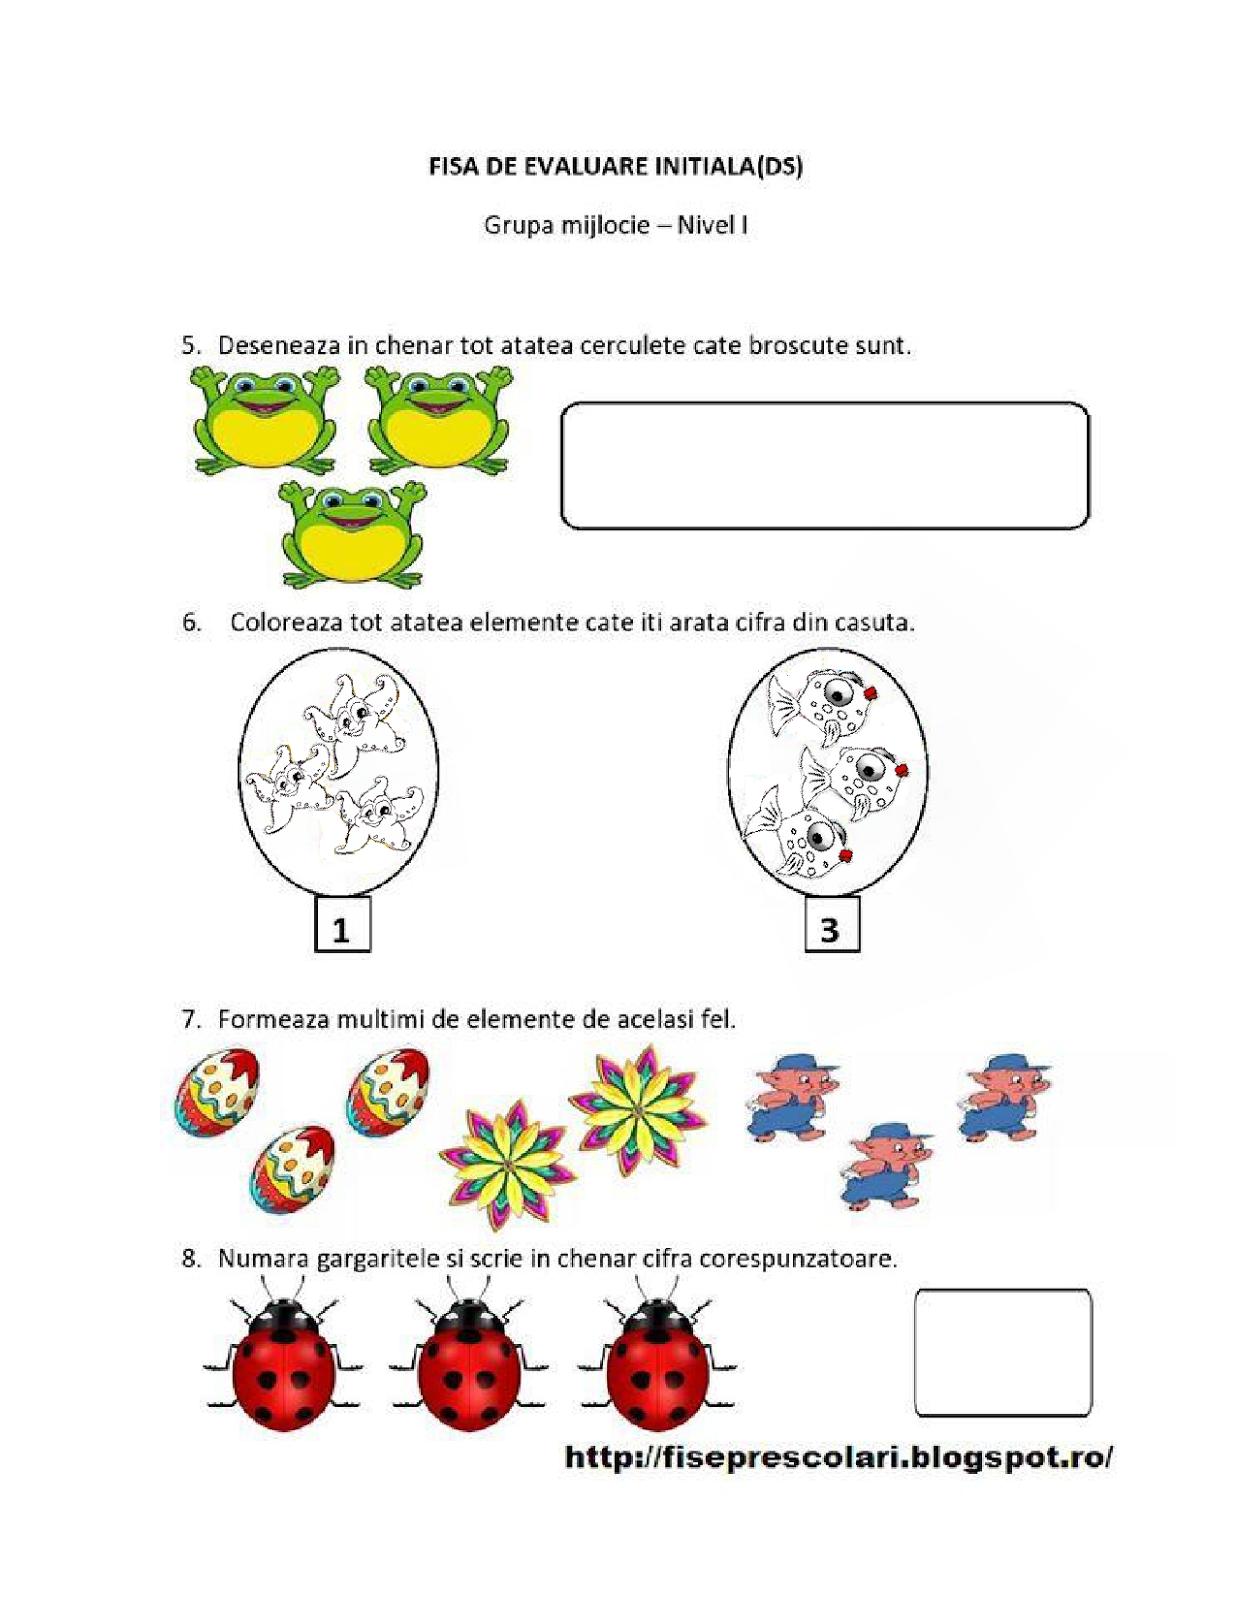 Focal papillomas